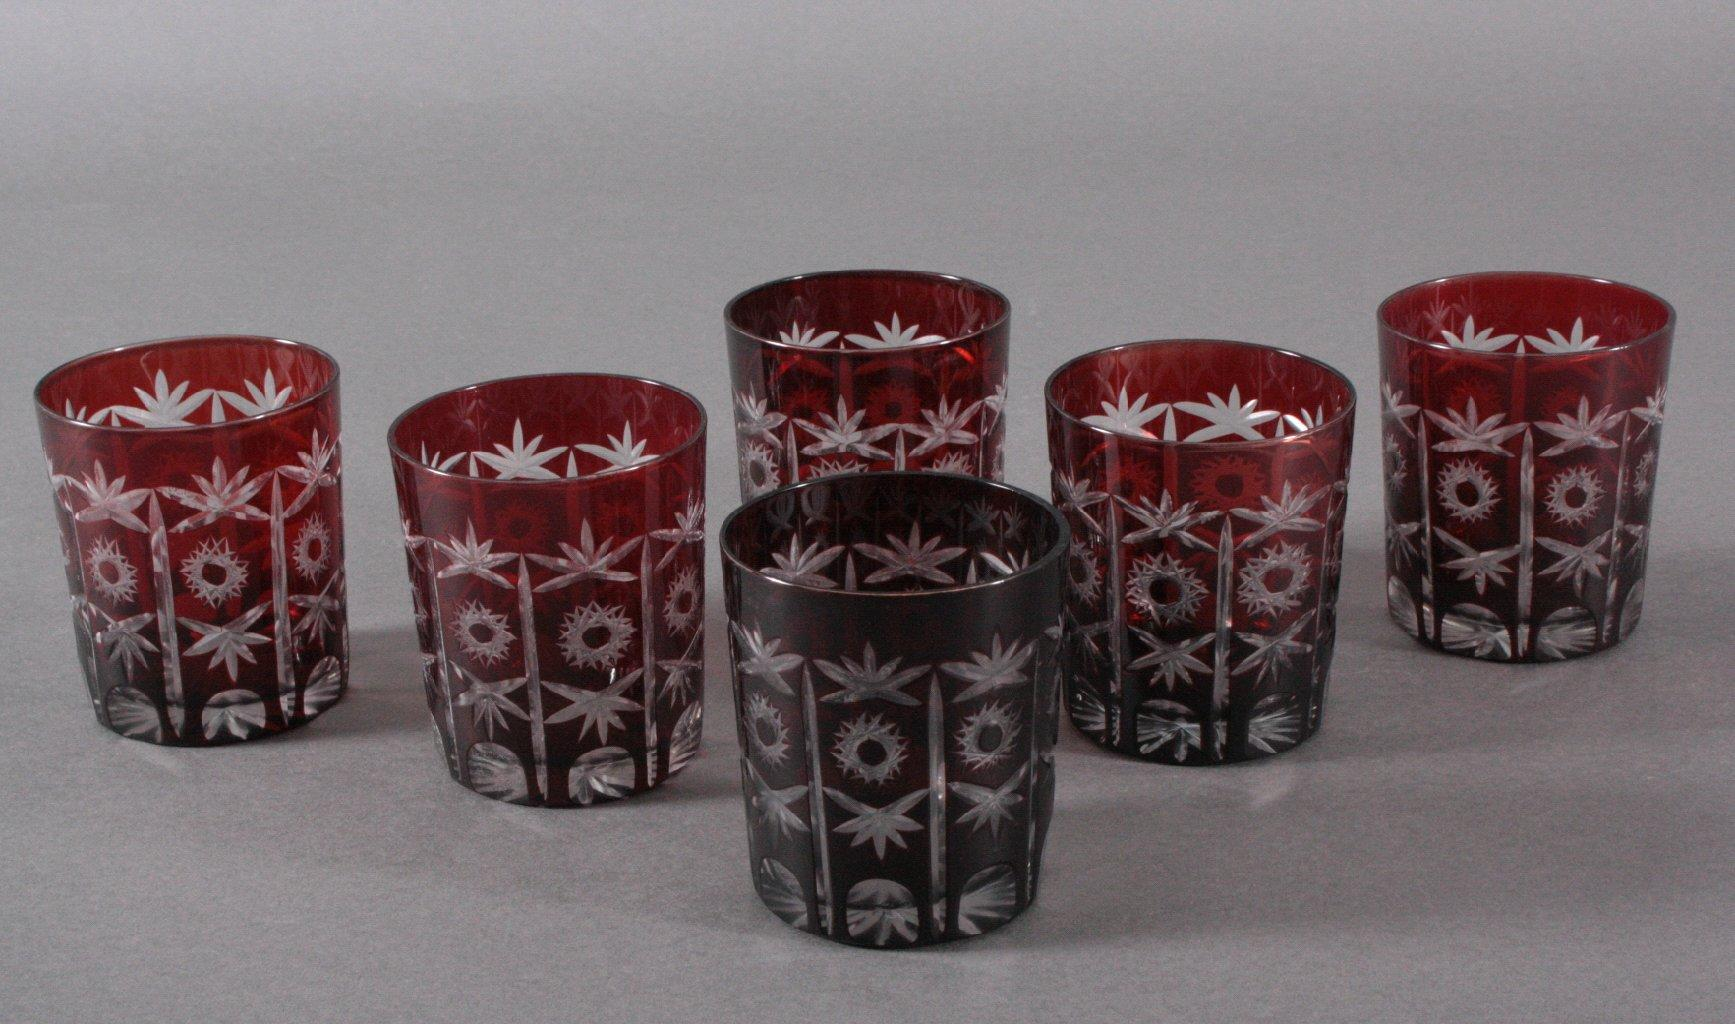 6 böhmische Gläser, 1. Hälfte 20. Jh